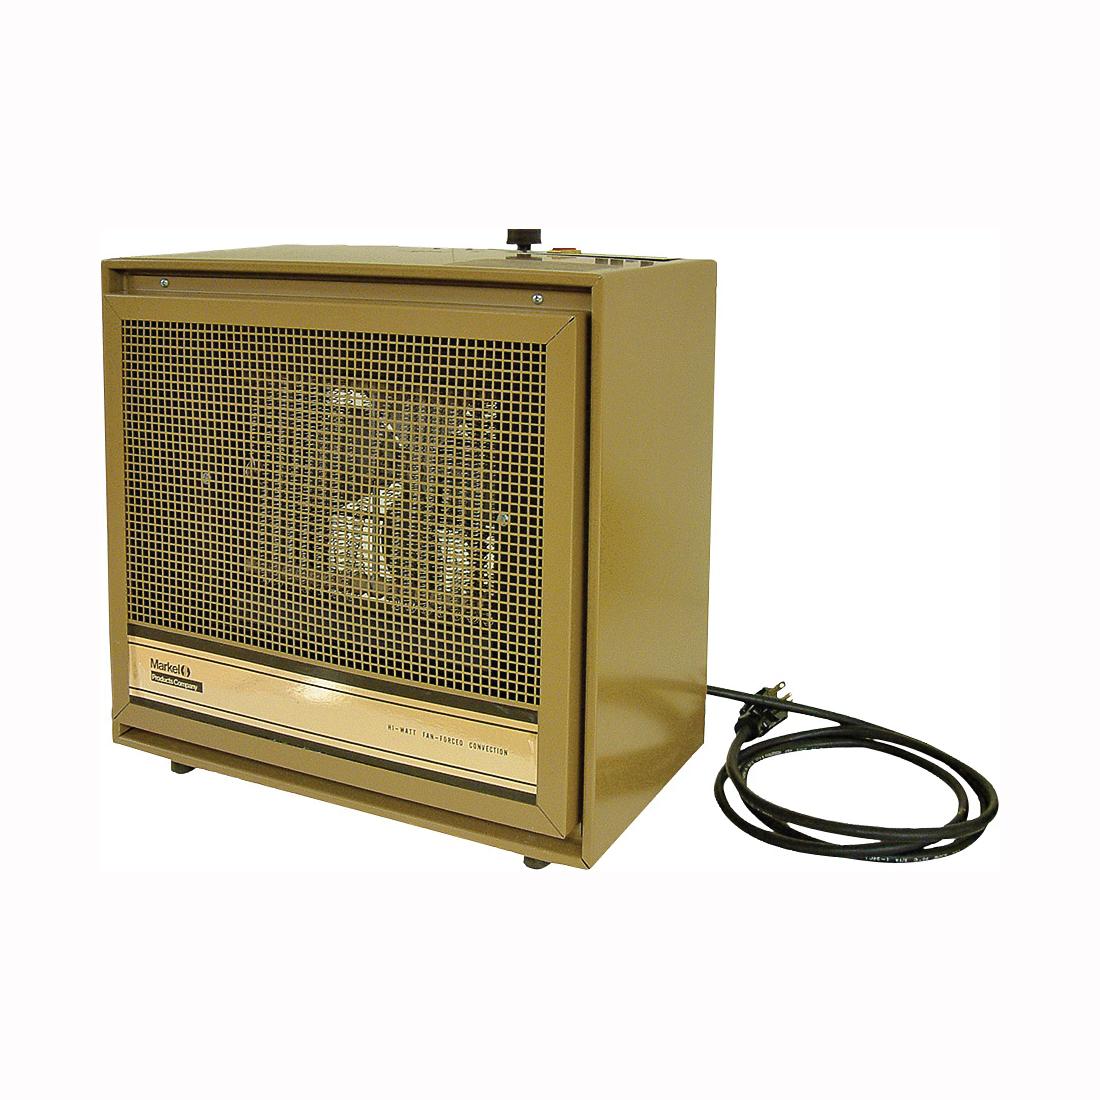 Picture of TPI 474 Series H474TMC Dual-Heat Portable Heater, 8.3/16.6 A, 240 V, 1920/3840 W, 13,106 Btu Heating